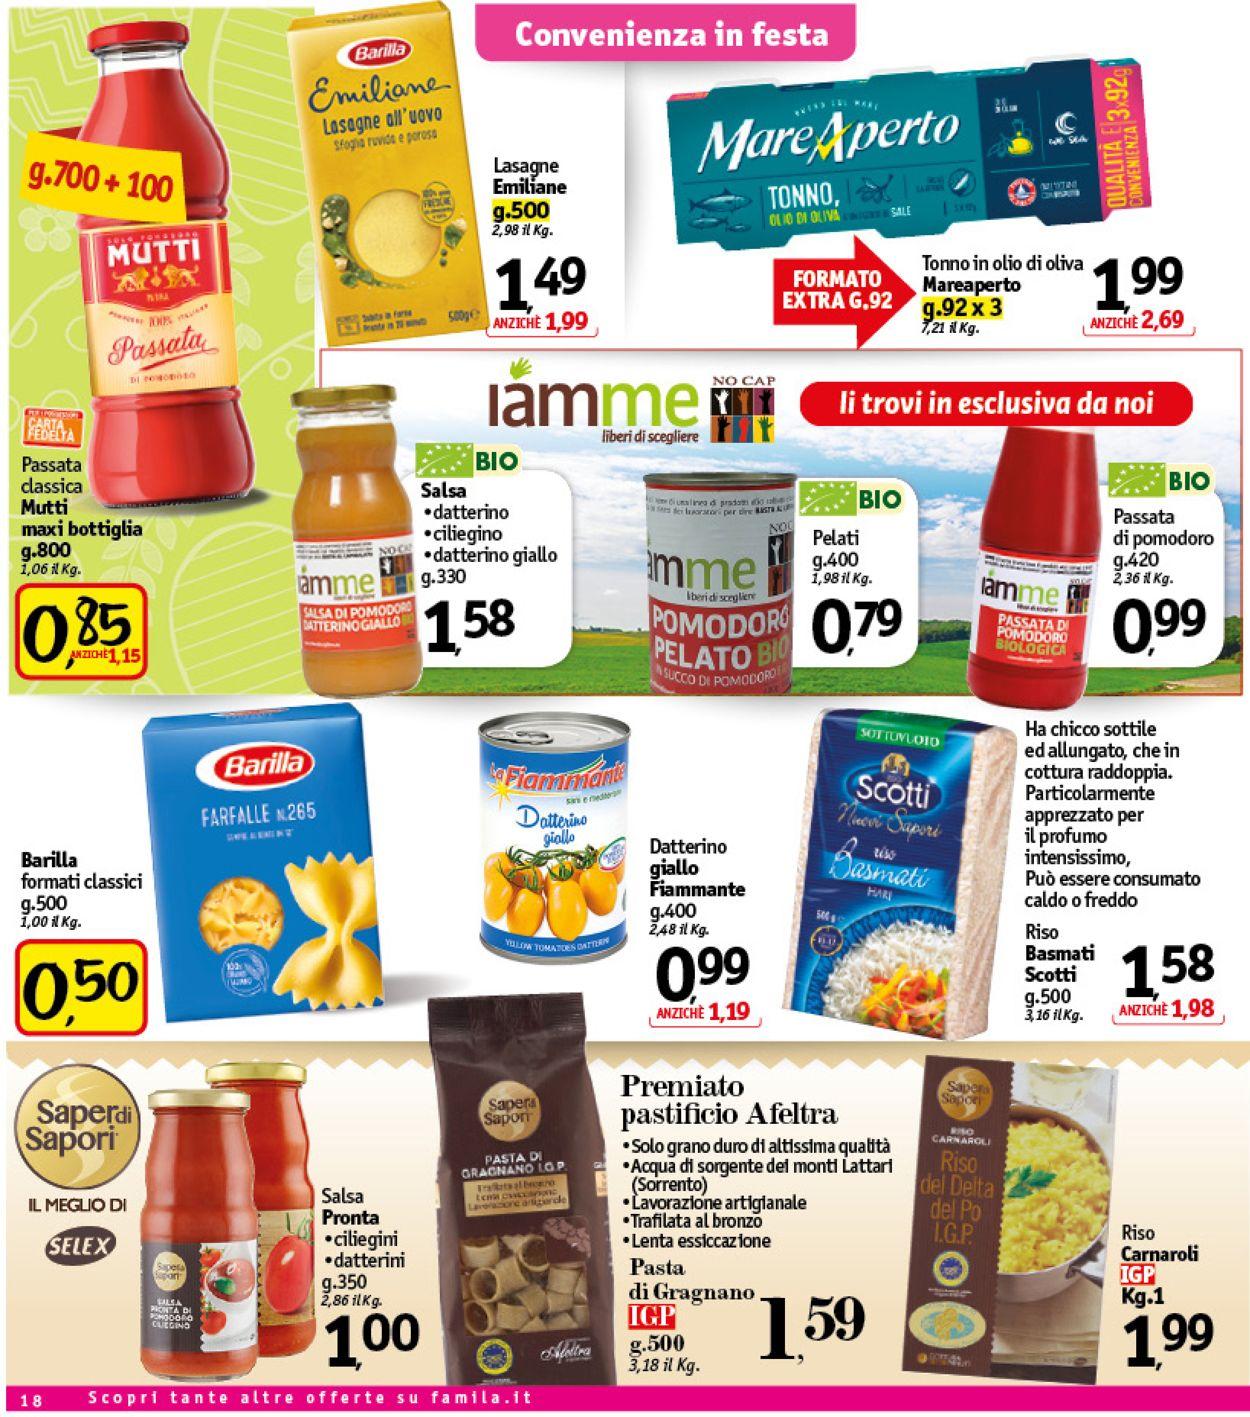 Volantino Famila - Pasqua 2021! - Offerte 24/03-02/04/2021 (Pagina 19)